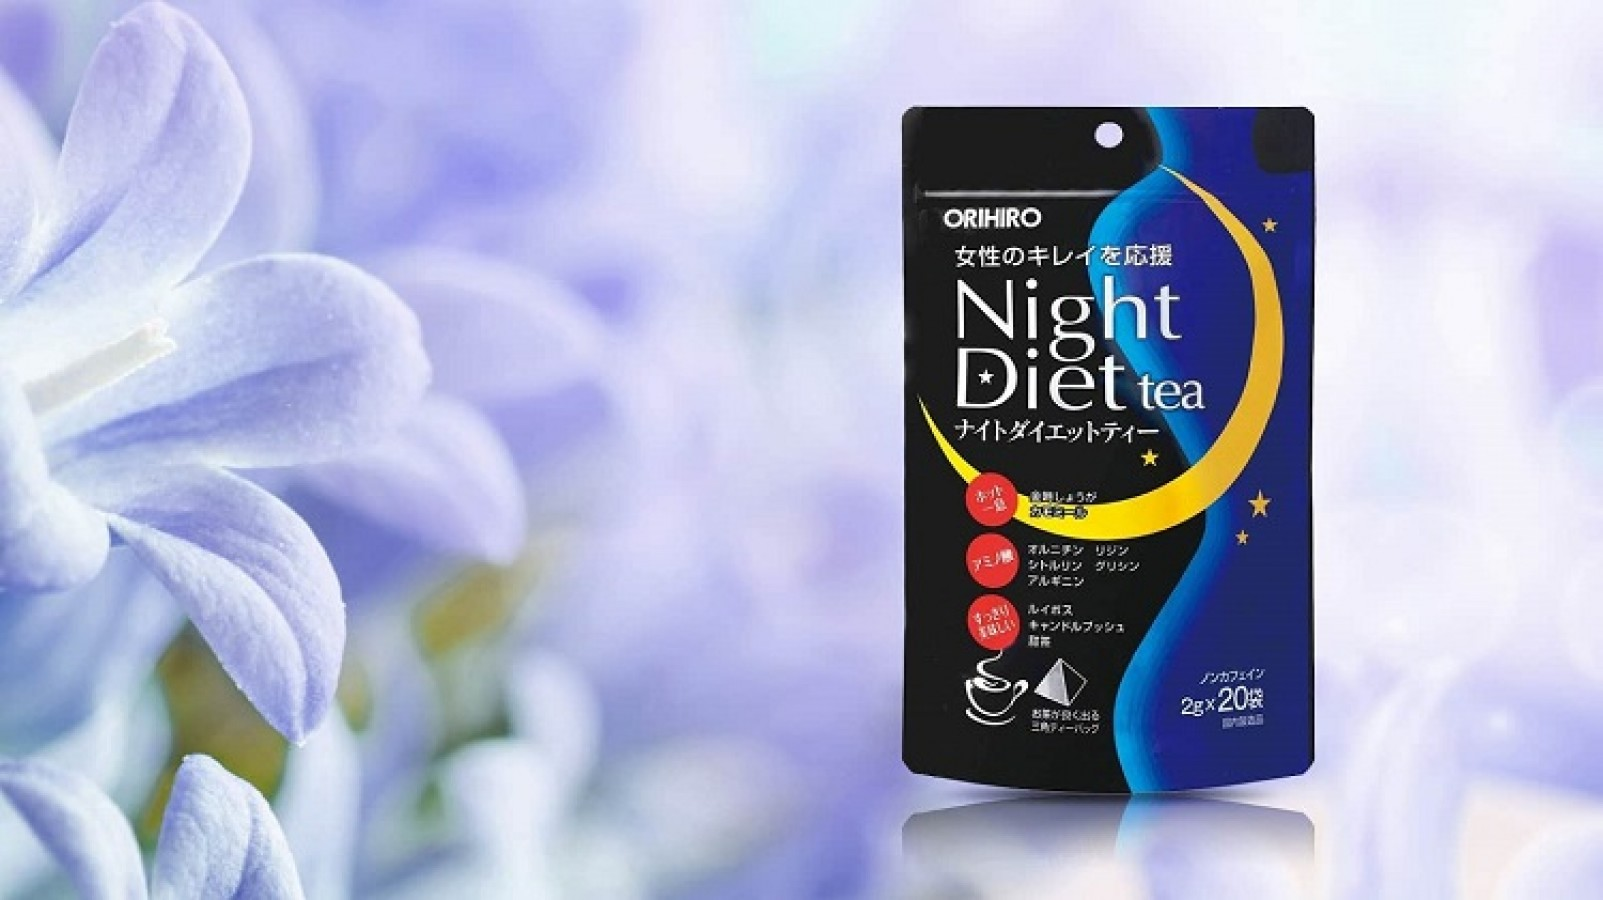 Trà Giảm Cân Orihiro Night Diet Tea Nhật Bản